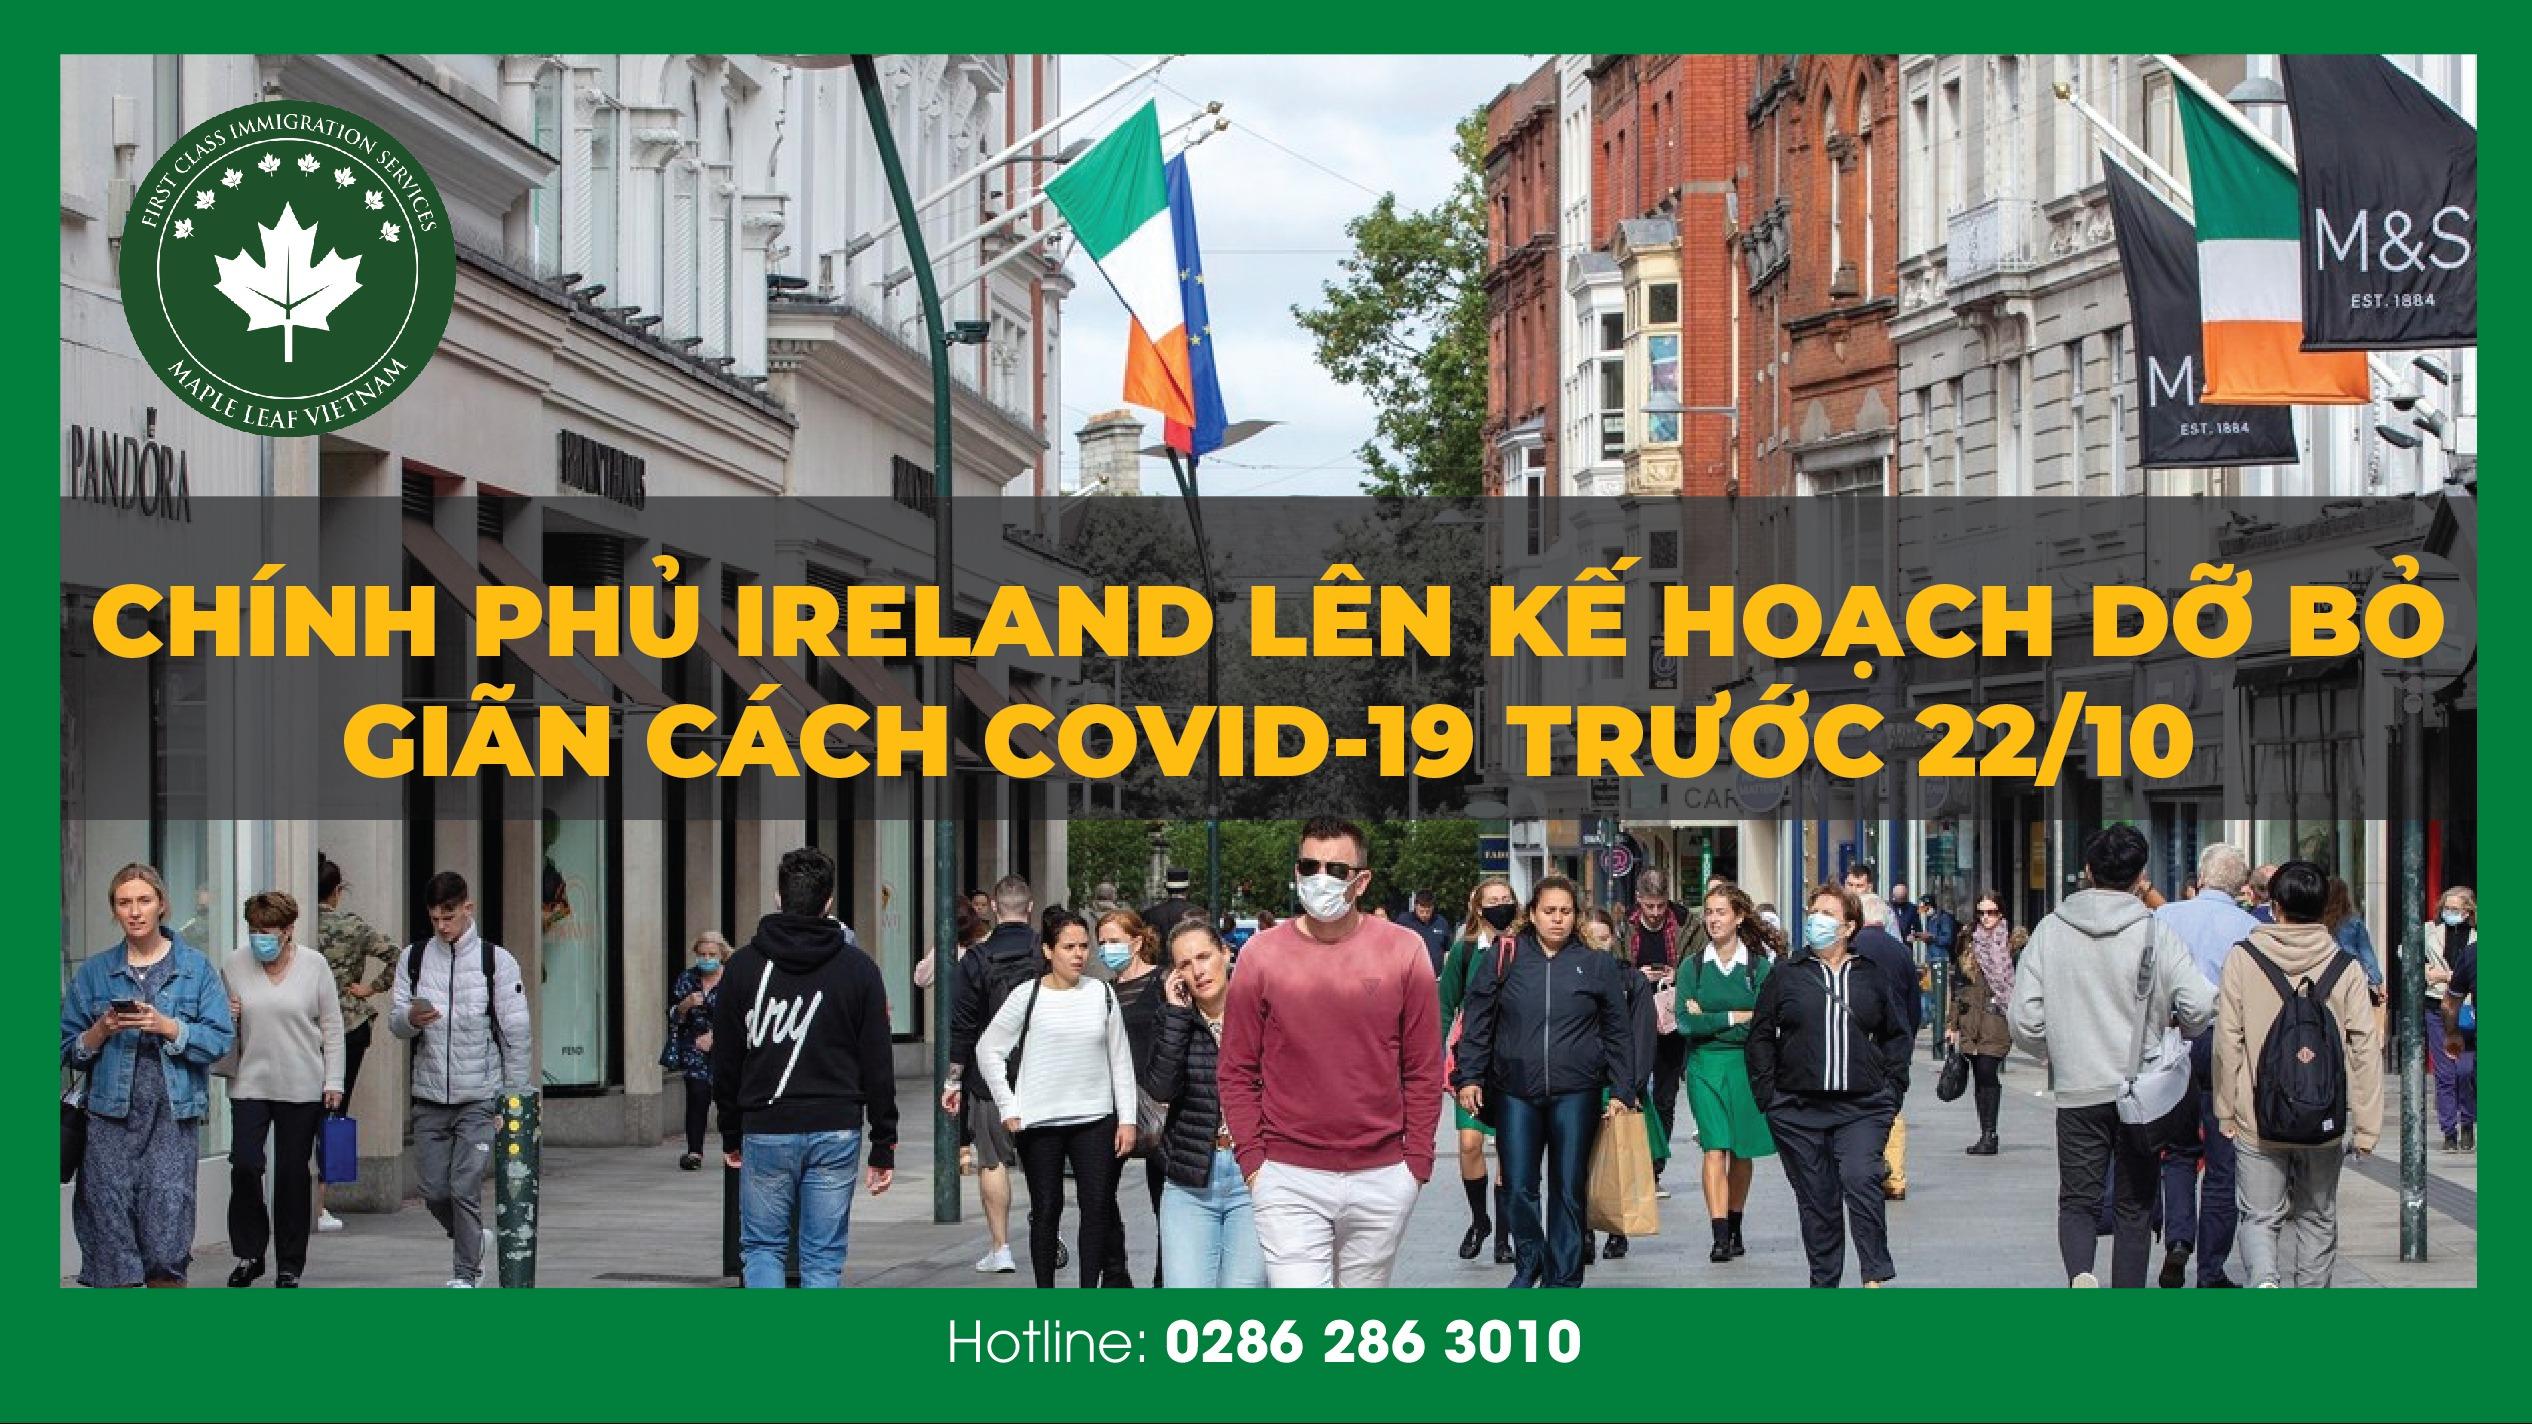 chinh-phu-ireland-len-ke-hoach-do-bo-gian-cach-covid-19-truoc-2210